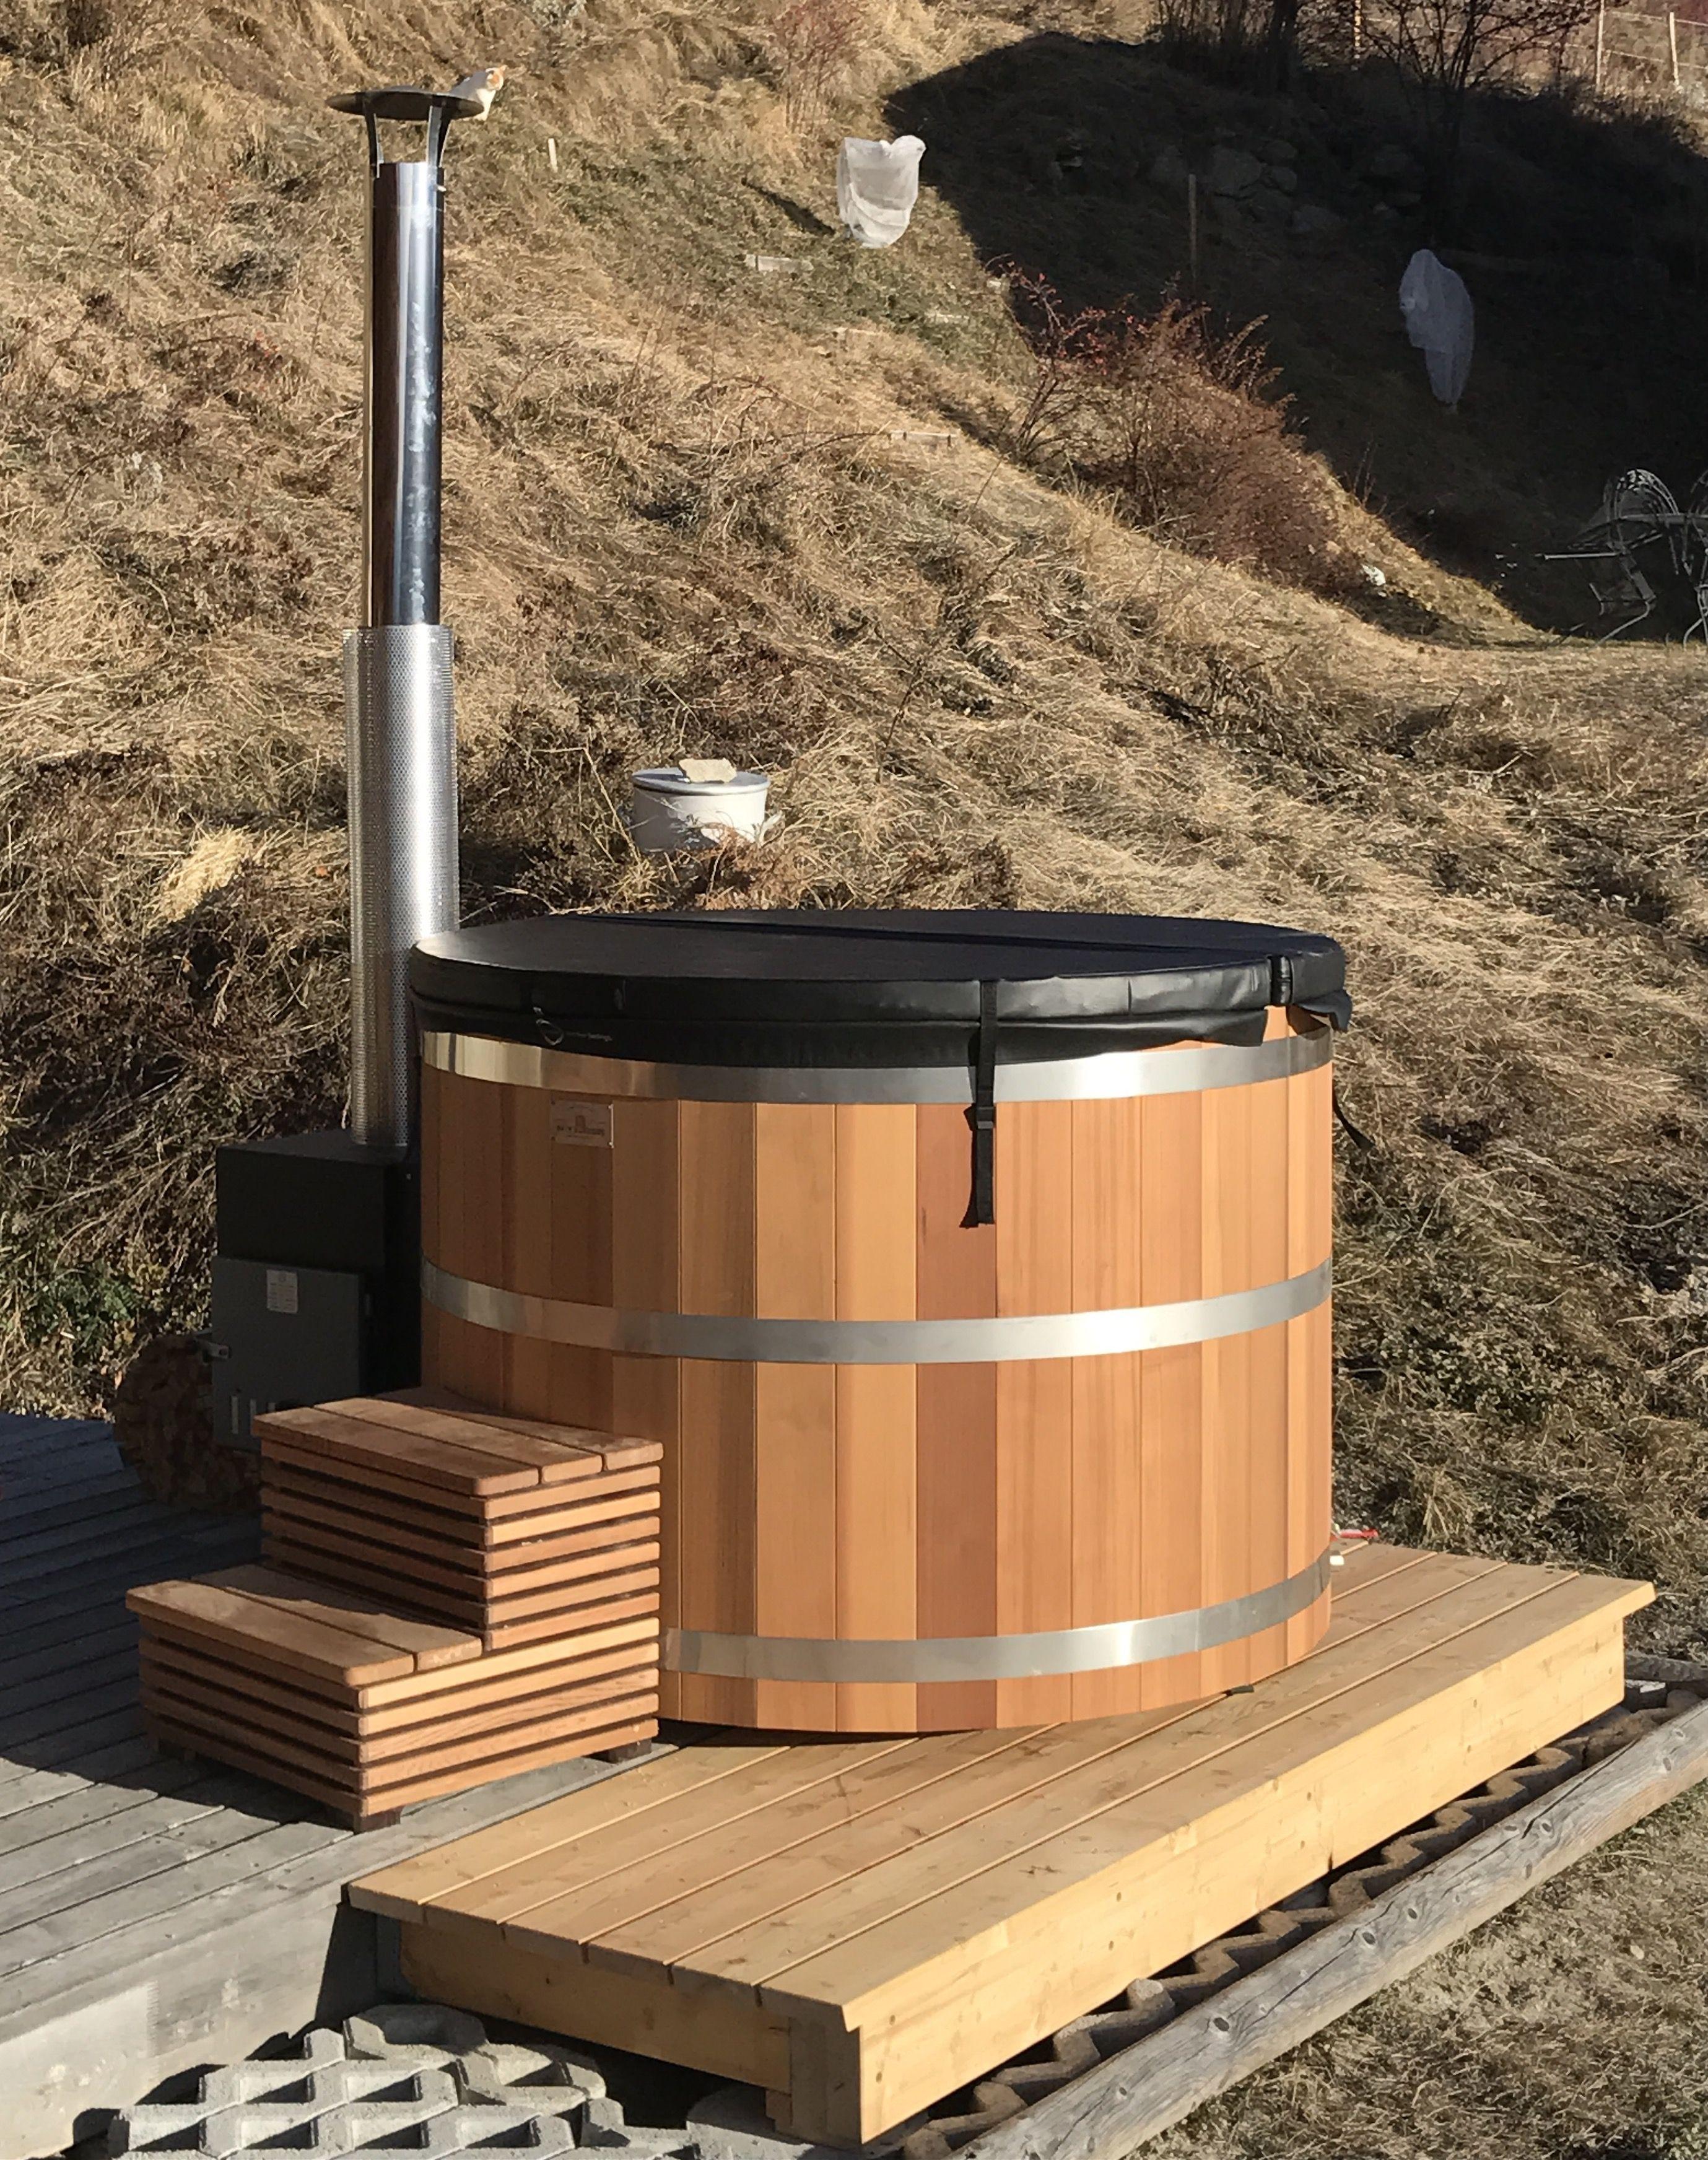 Bain nordique bain suédois hot tub | Bain nordique | Pinterest | Saunas